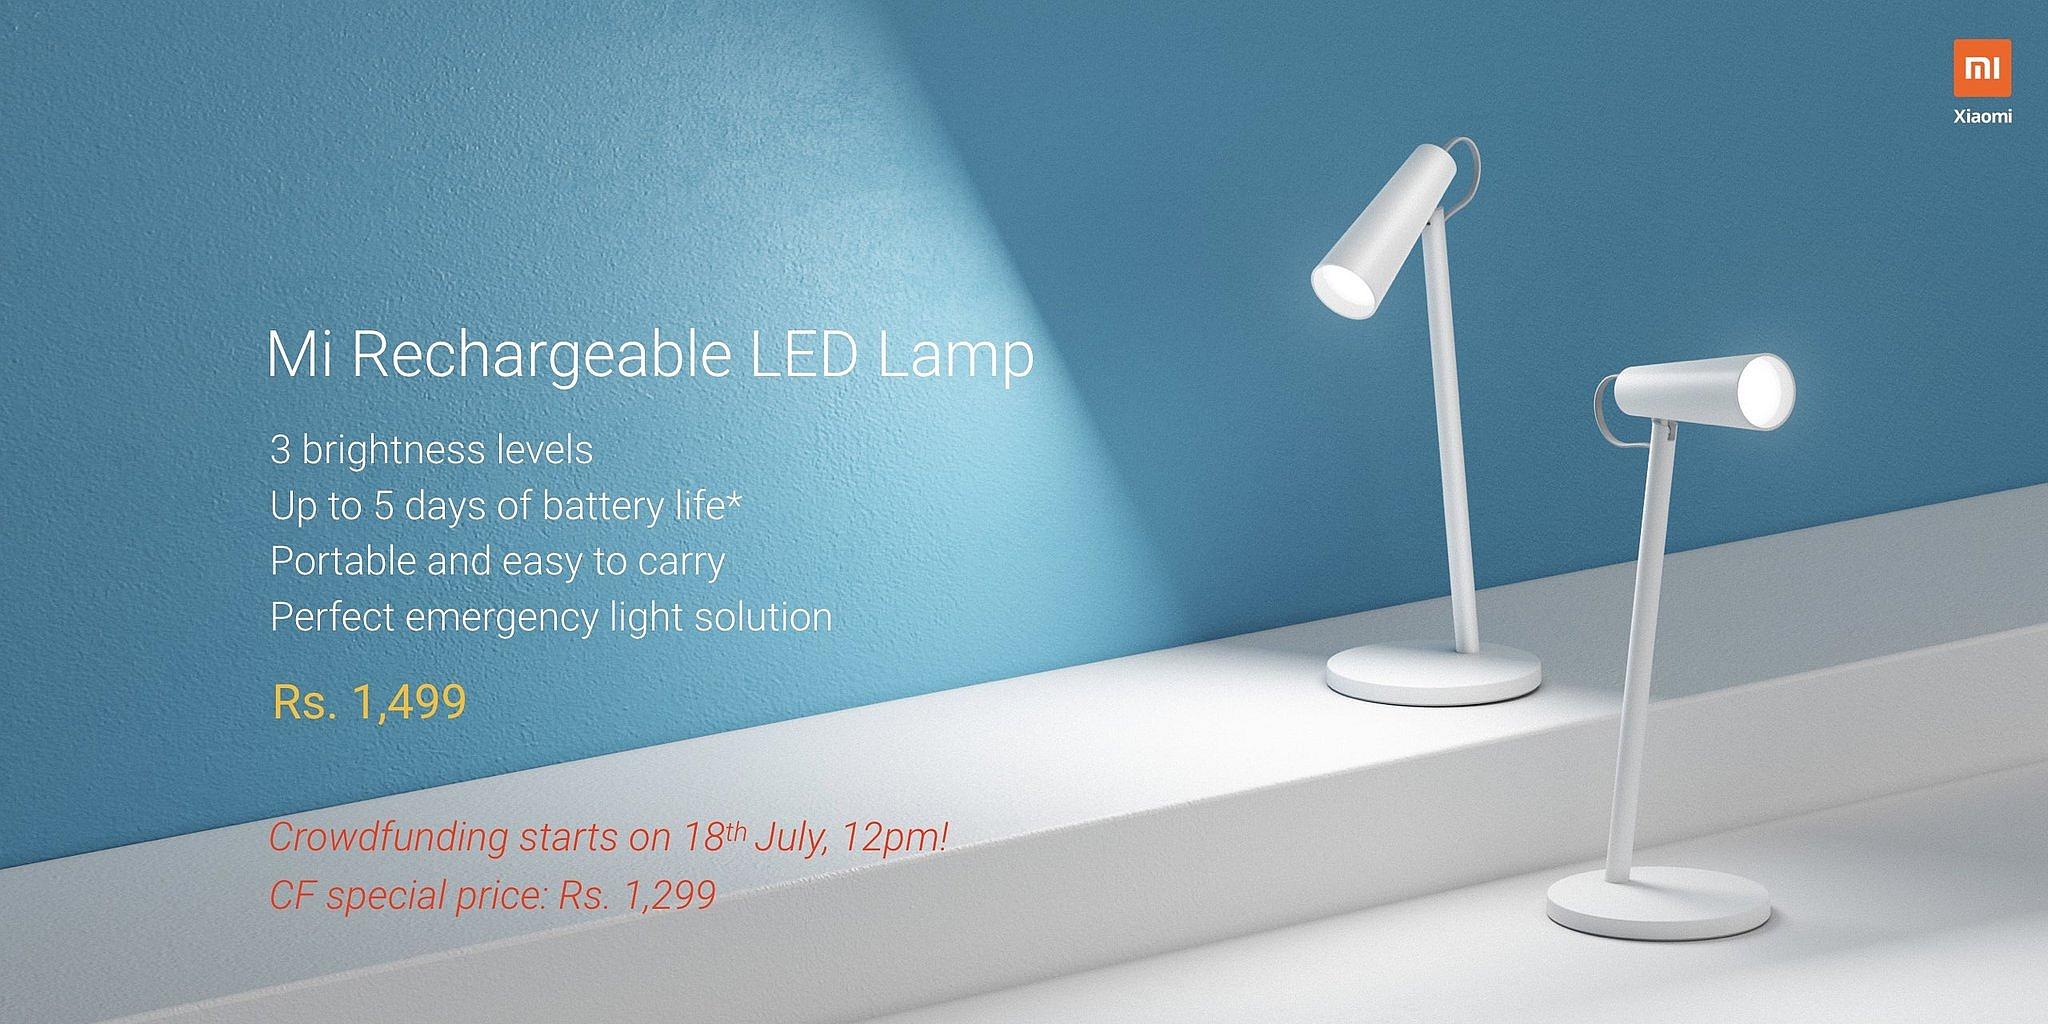 Bezprzewodowa lampka LED Xiaomi / fot. Mi